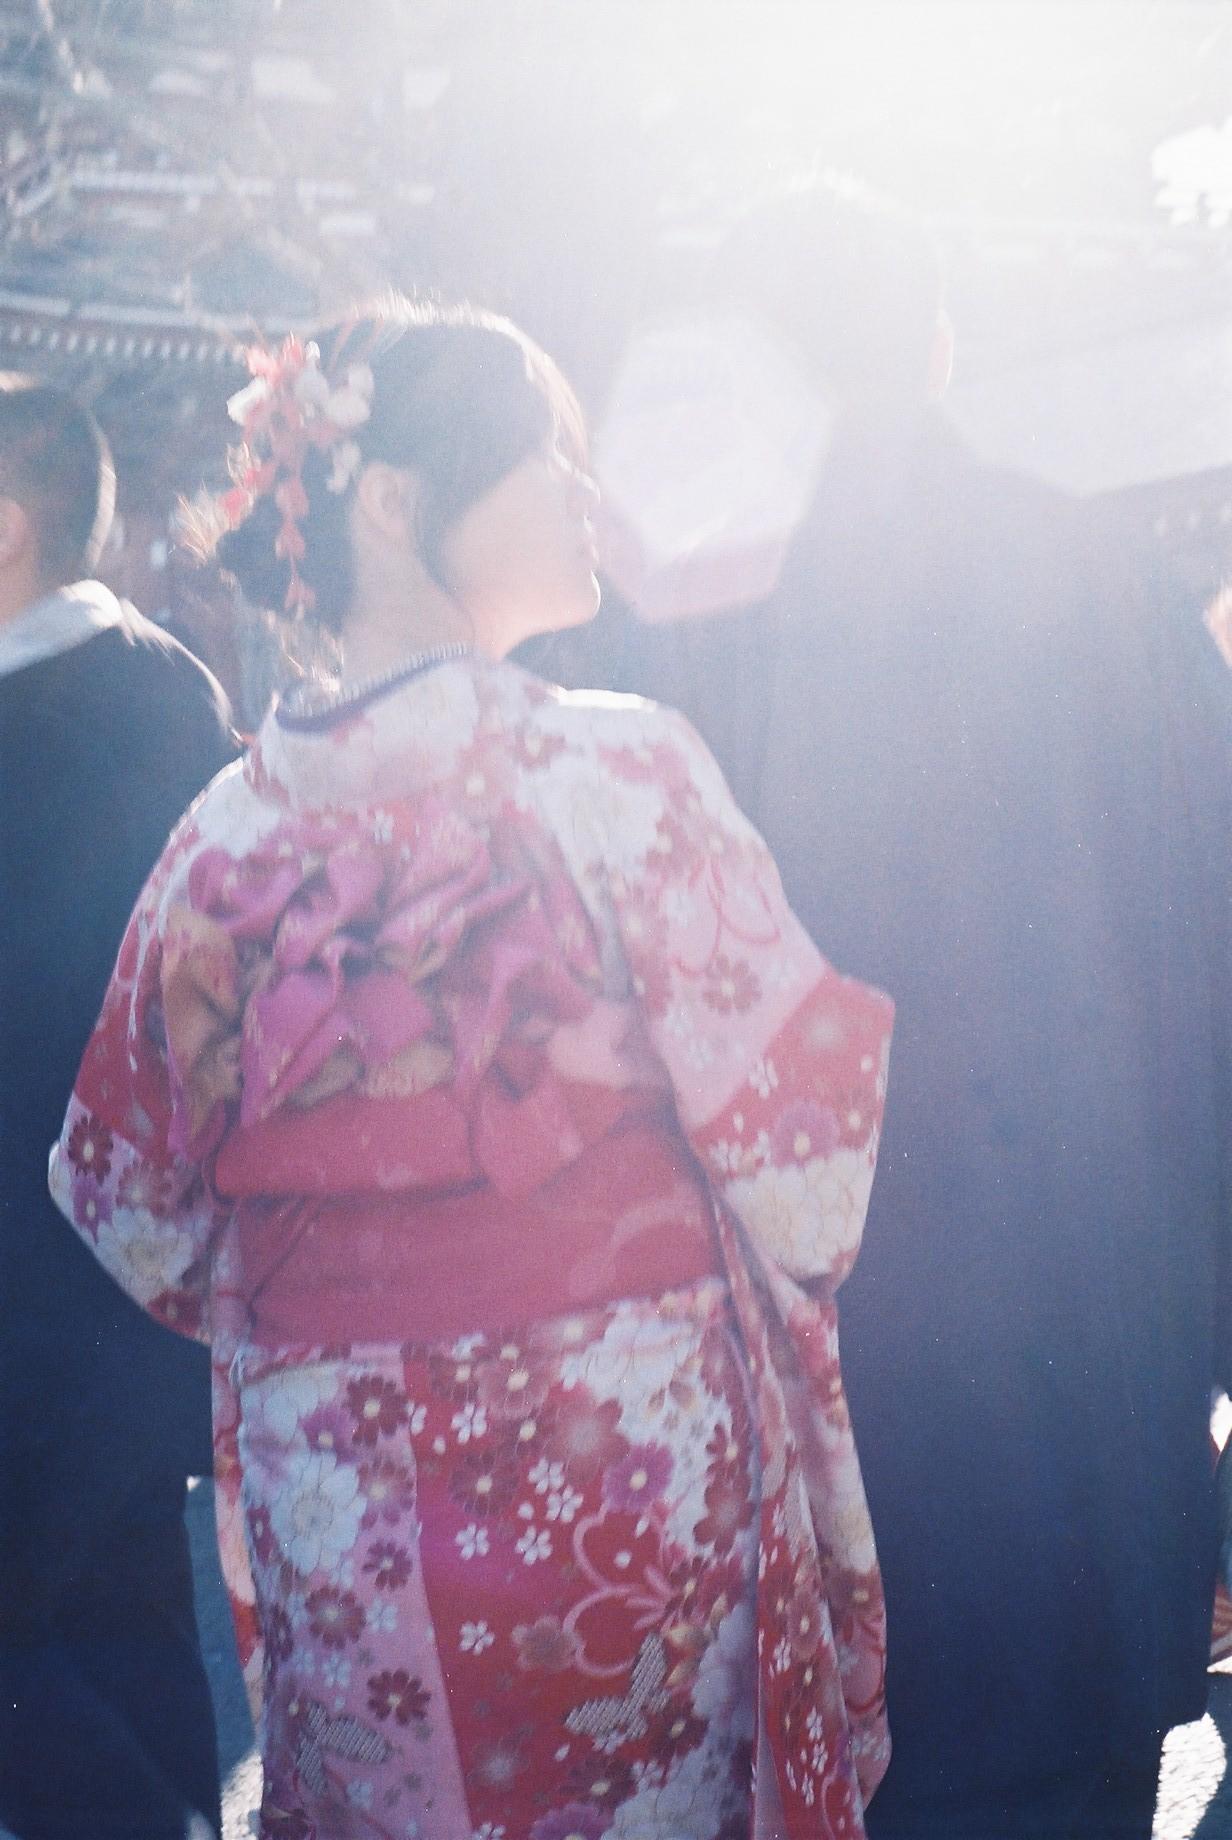 Rika Hoffman  | Tokyo in January | Minolta SRT 101